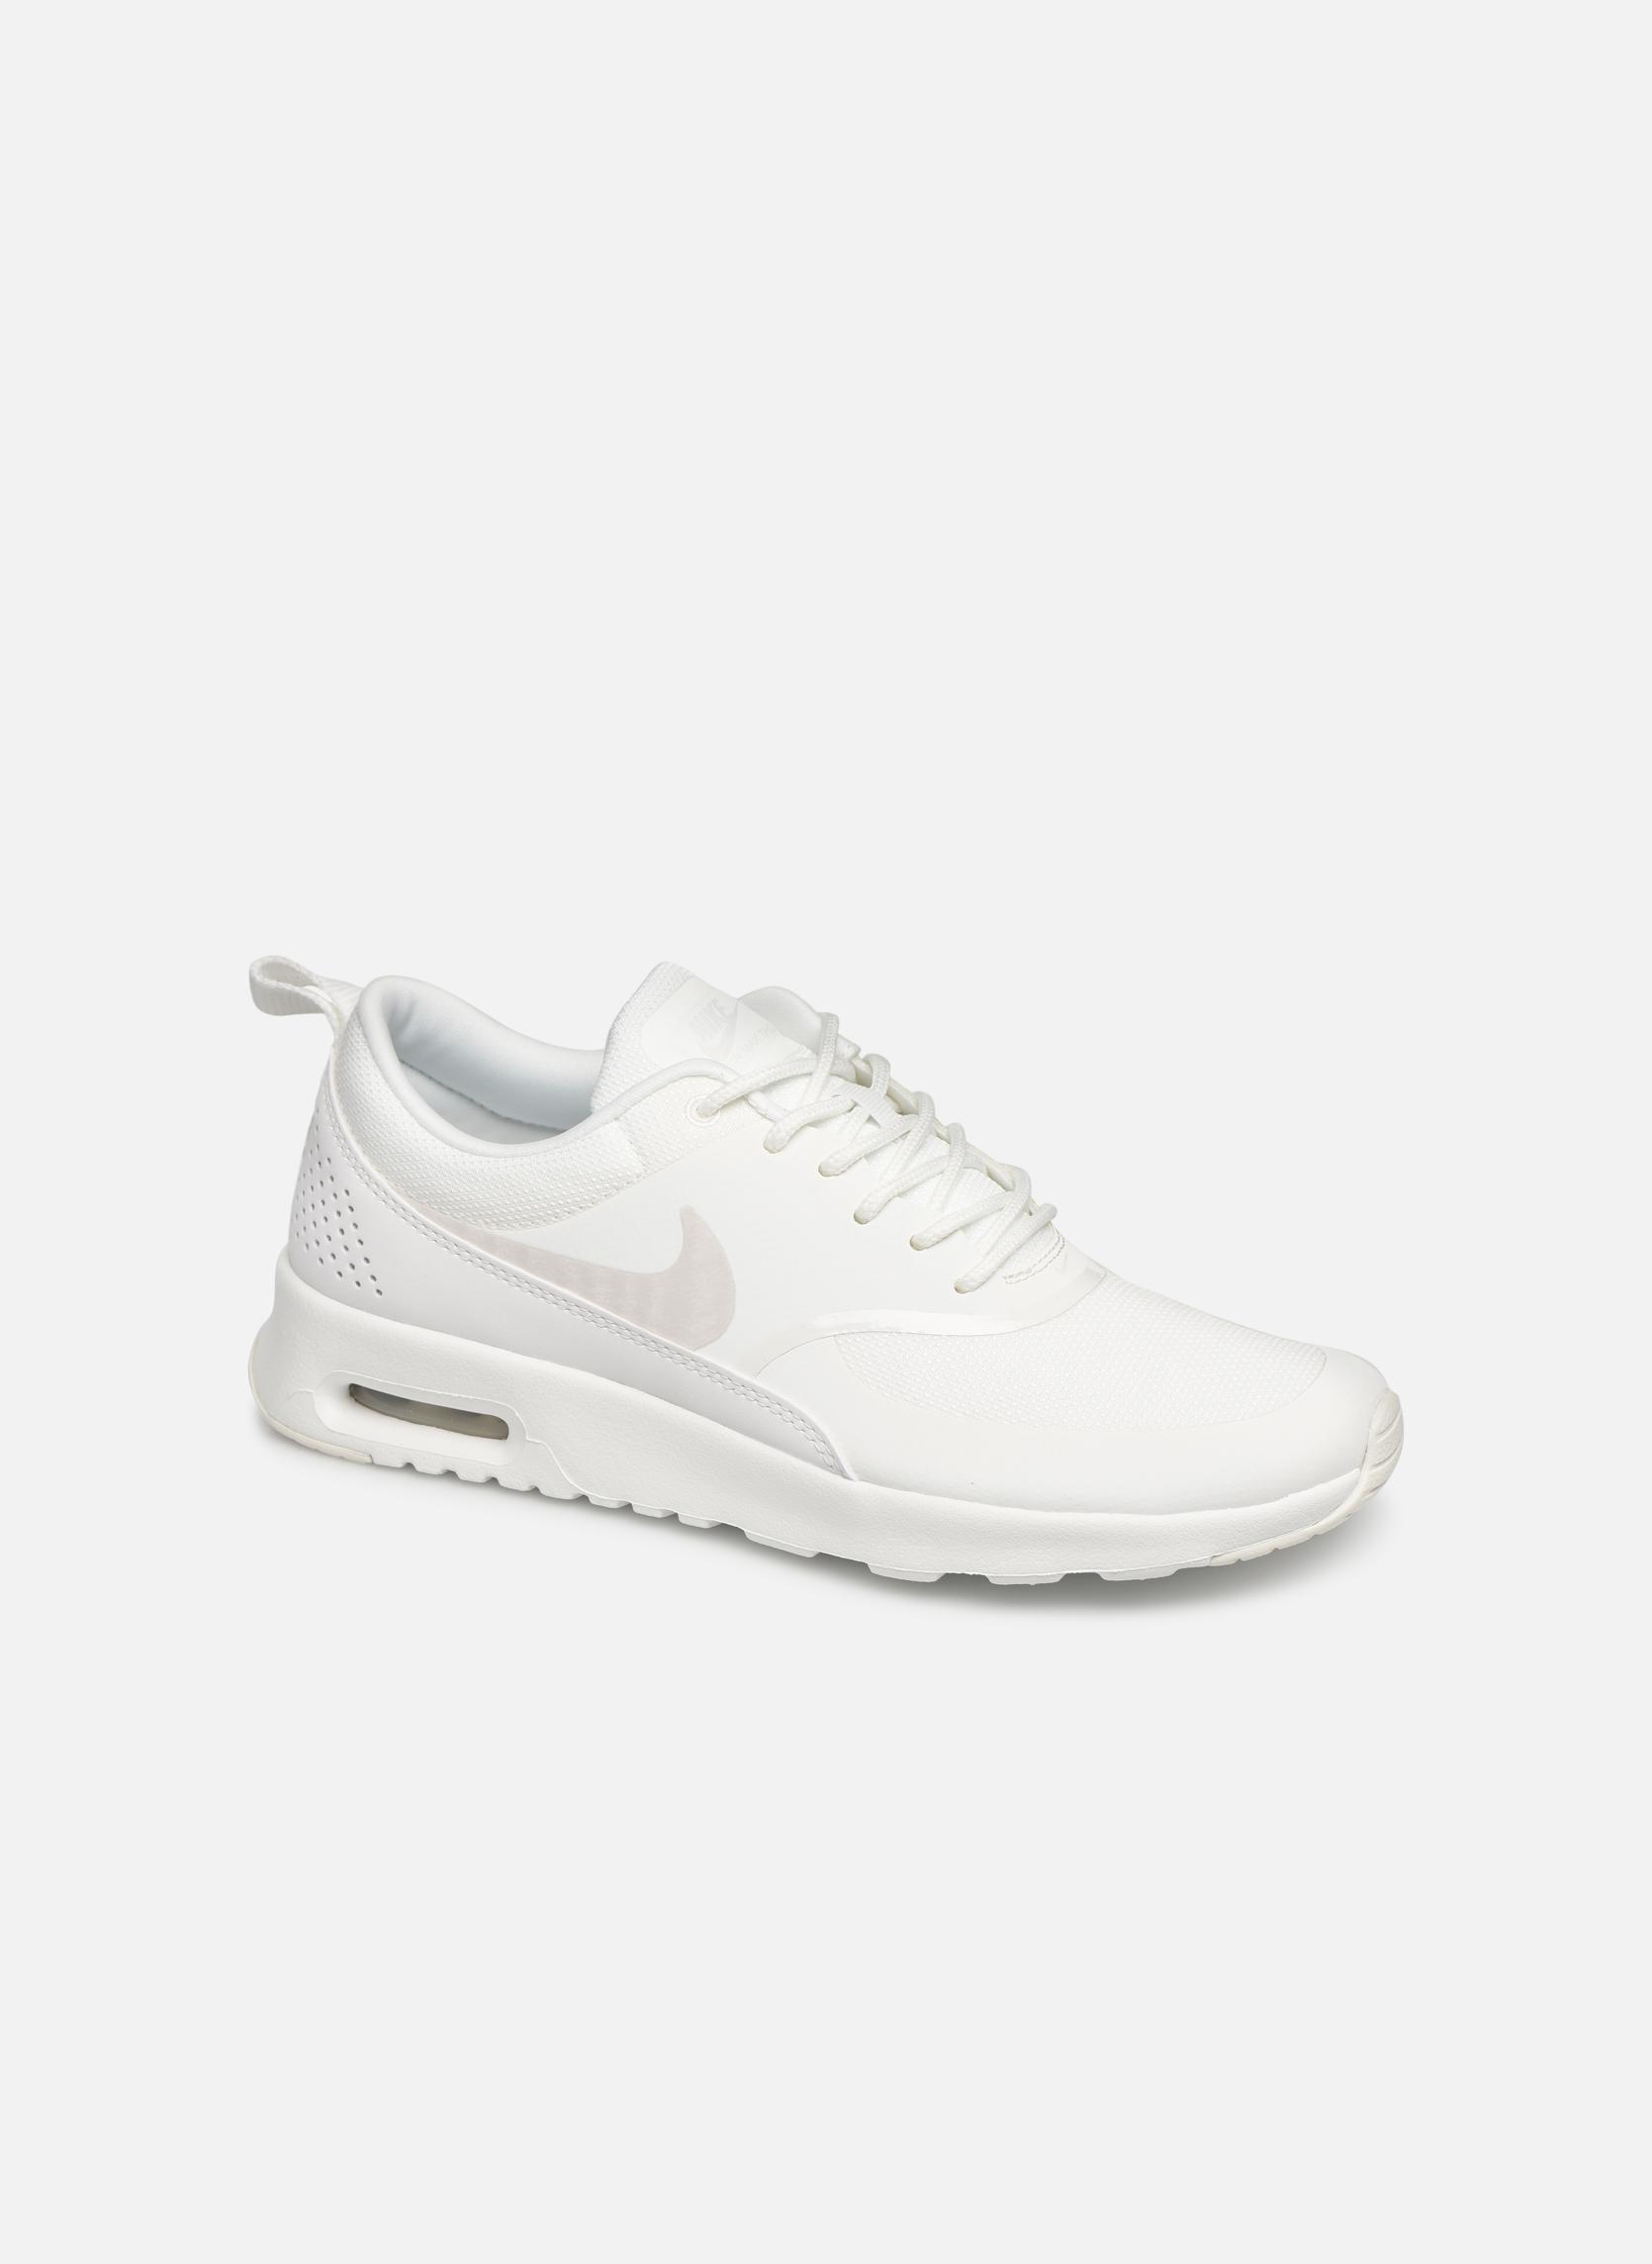 fbd4b854158 sneakers Nike Tanjun (GS) Girls' Shoe 818384 061 - SchoenenTamTam.nl